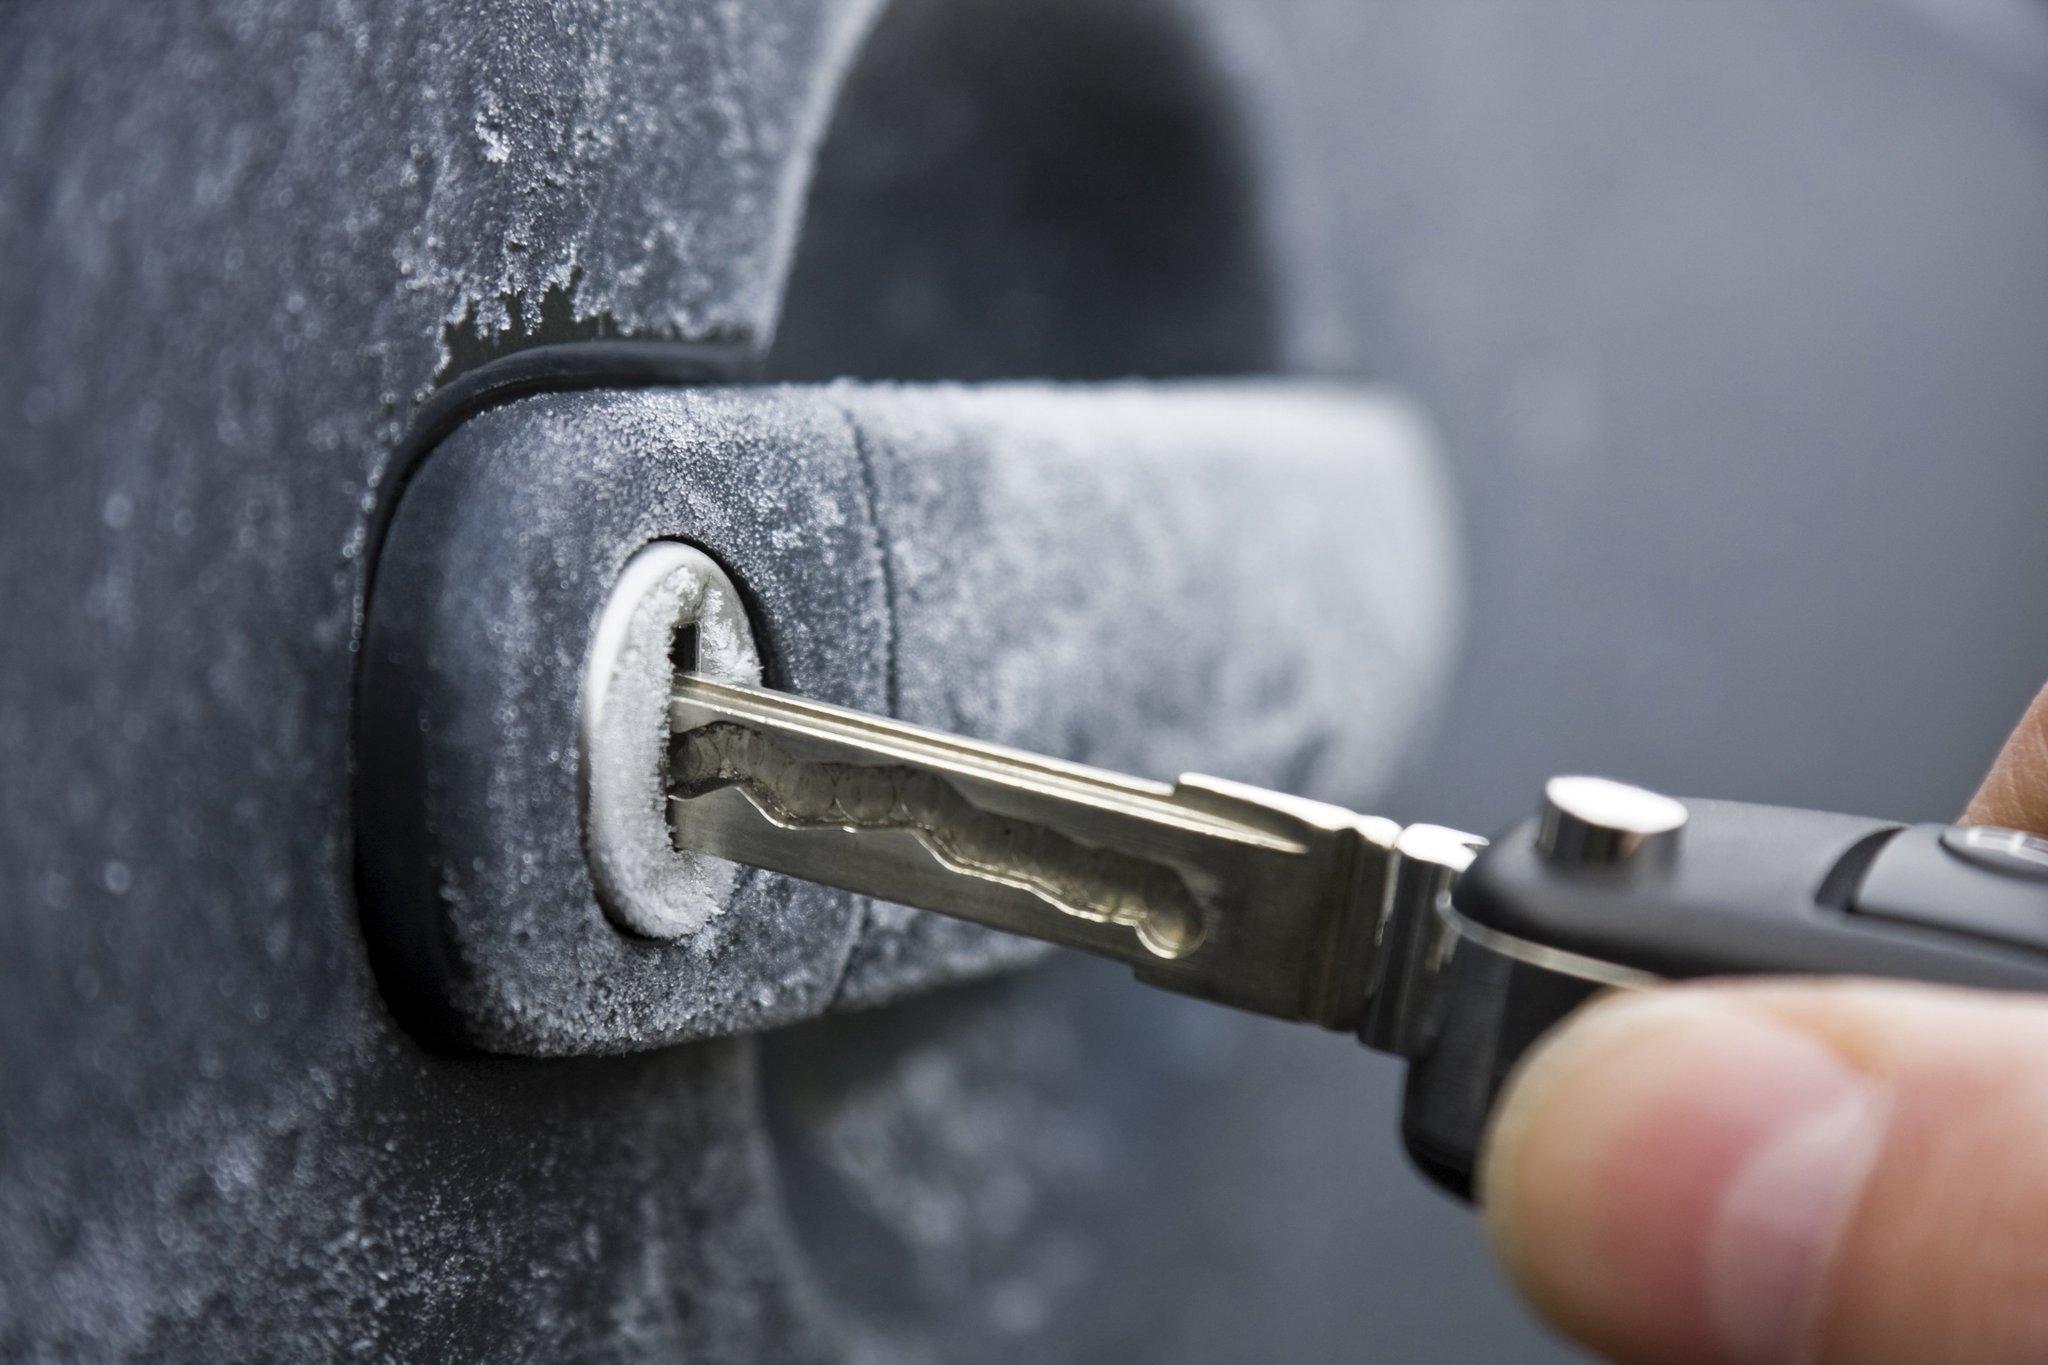 chi_man_locking_not_stealing_from_cars_20141227_1.jpg